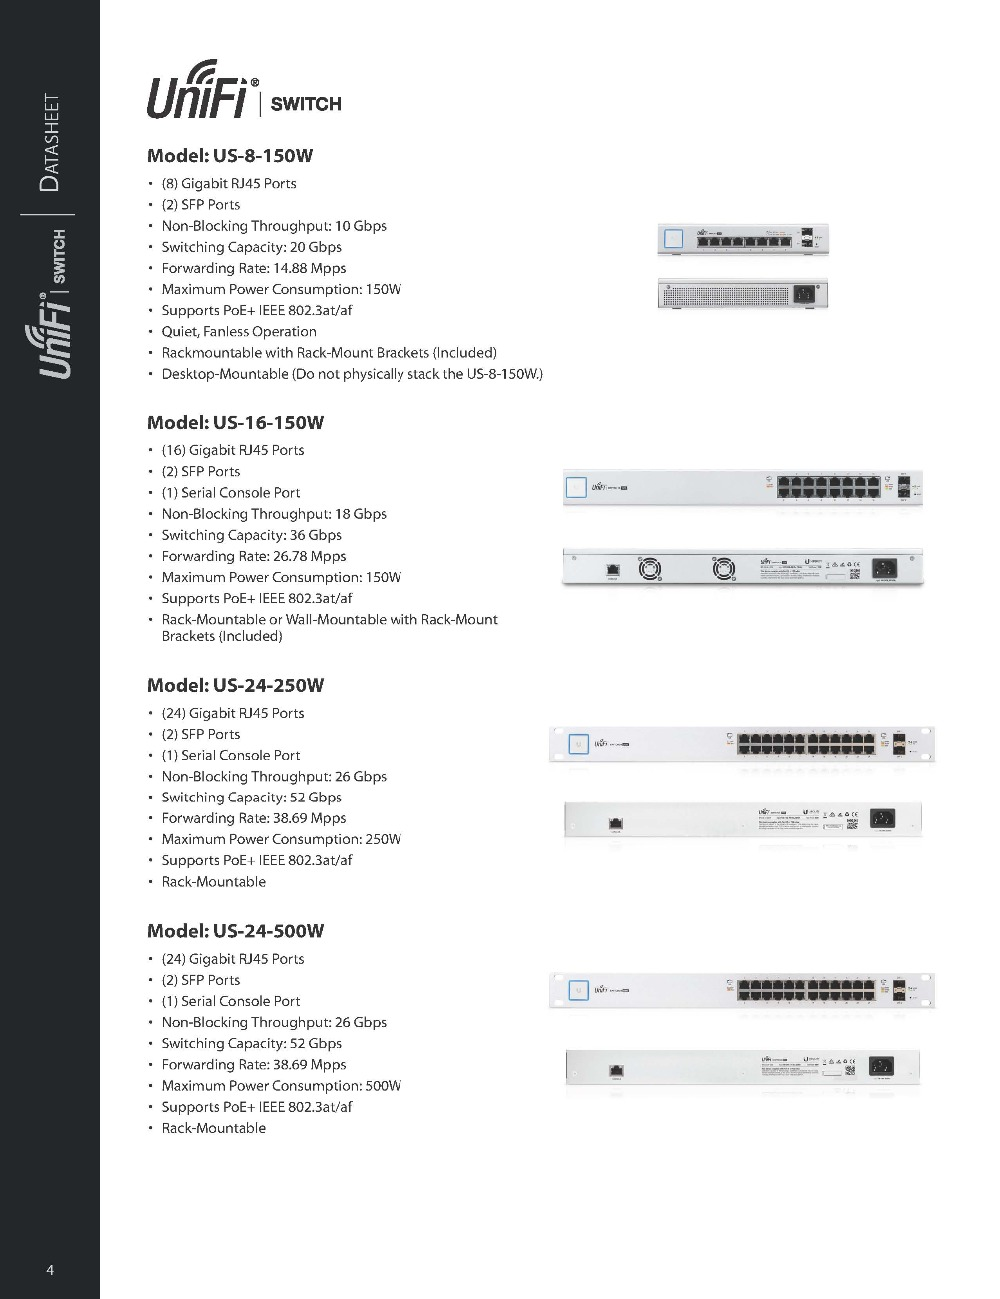 Ubiquiti UniFi Switch US-24-250W 802 3af/at Managed PoE+ Gigabit Switch  with SFP Unifi Switch